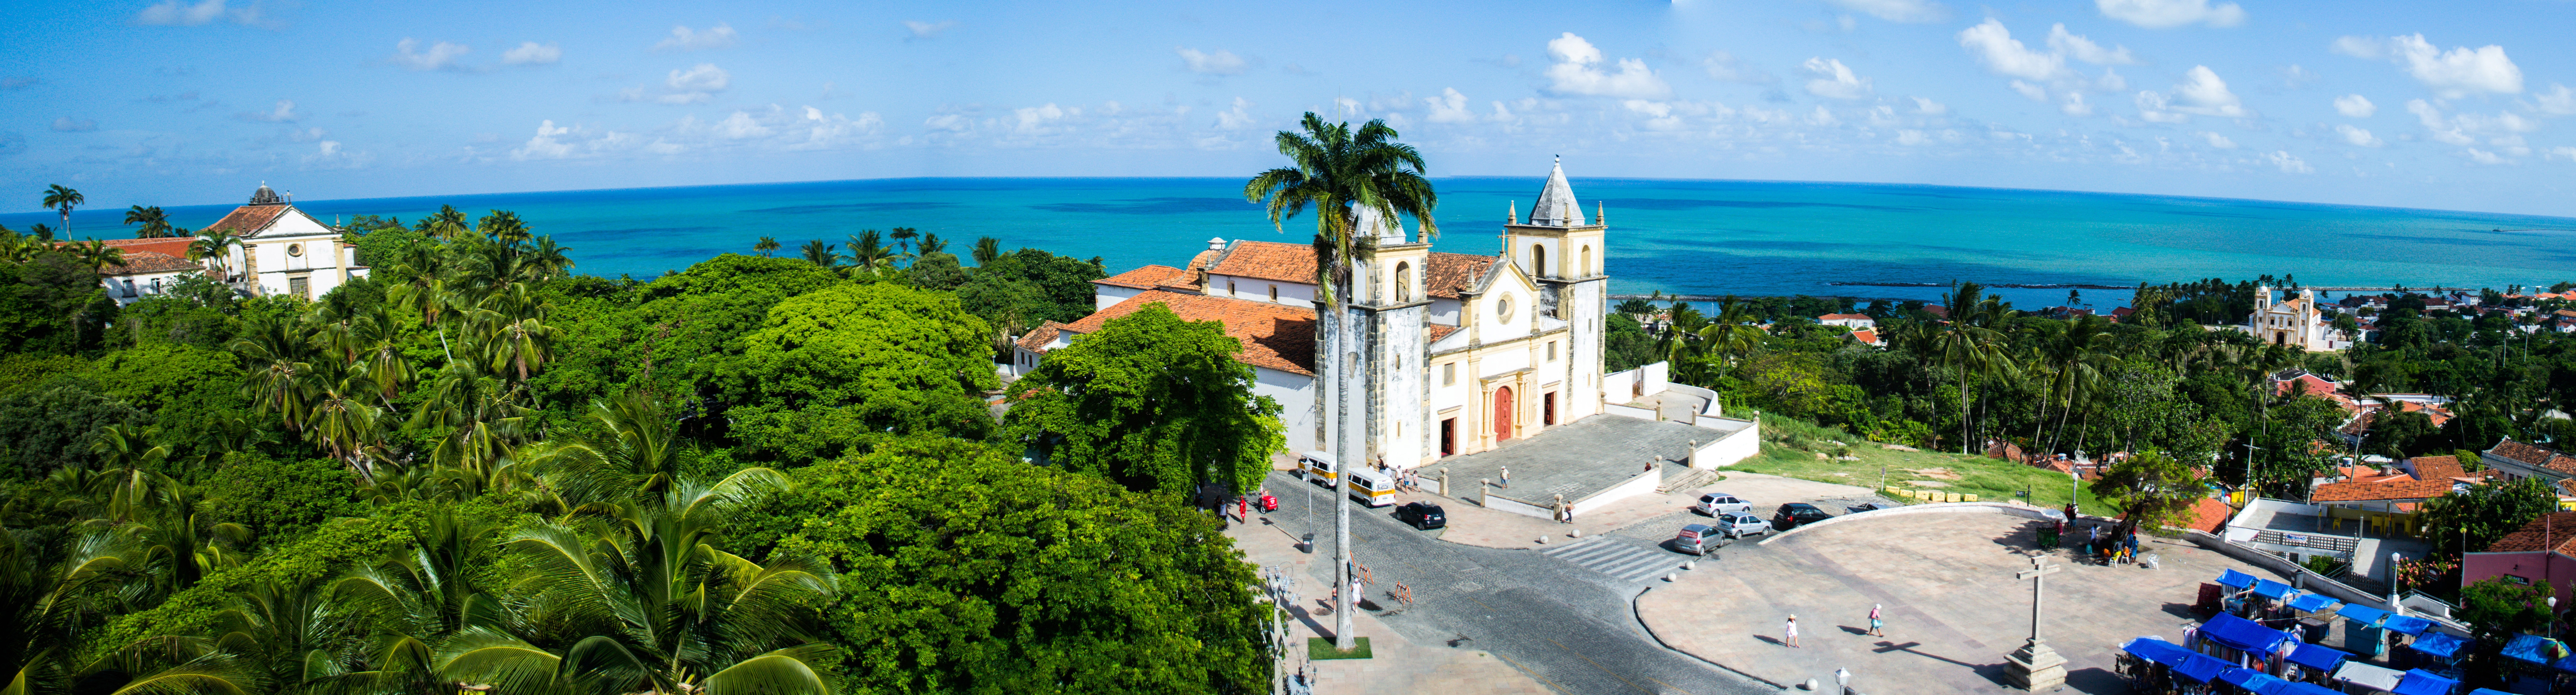 Panoramic_view_-_Olinda,_Pernambuco,_Brazil